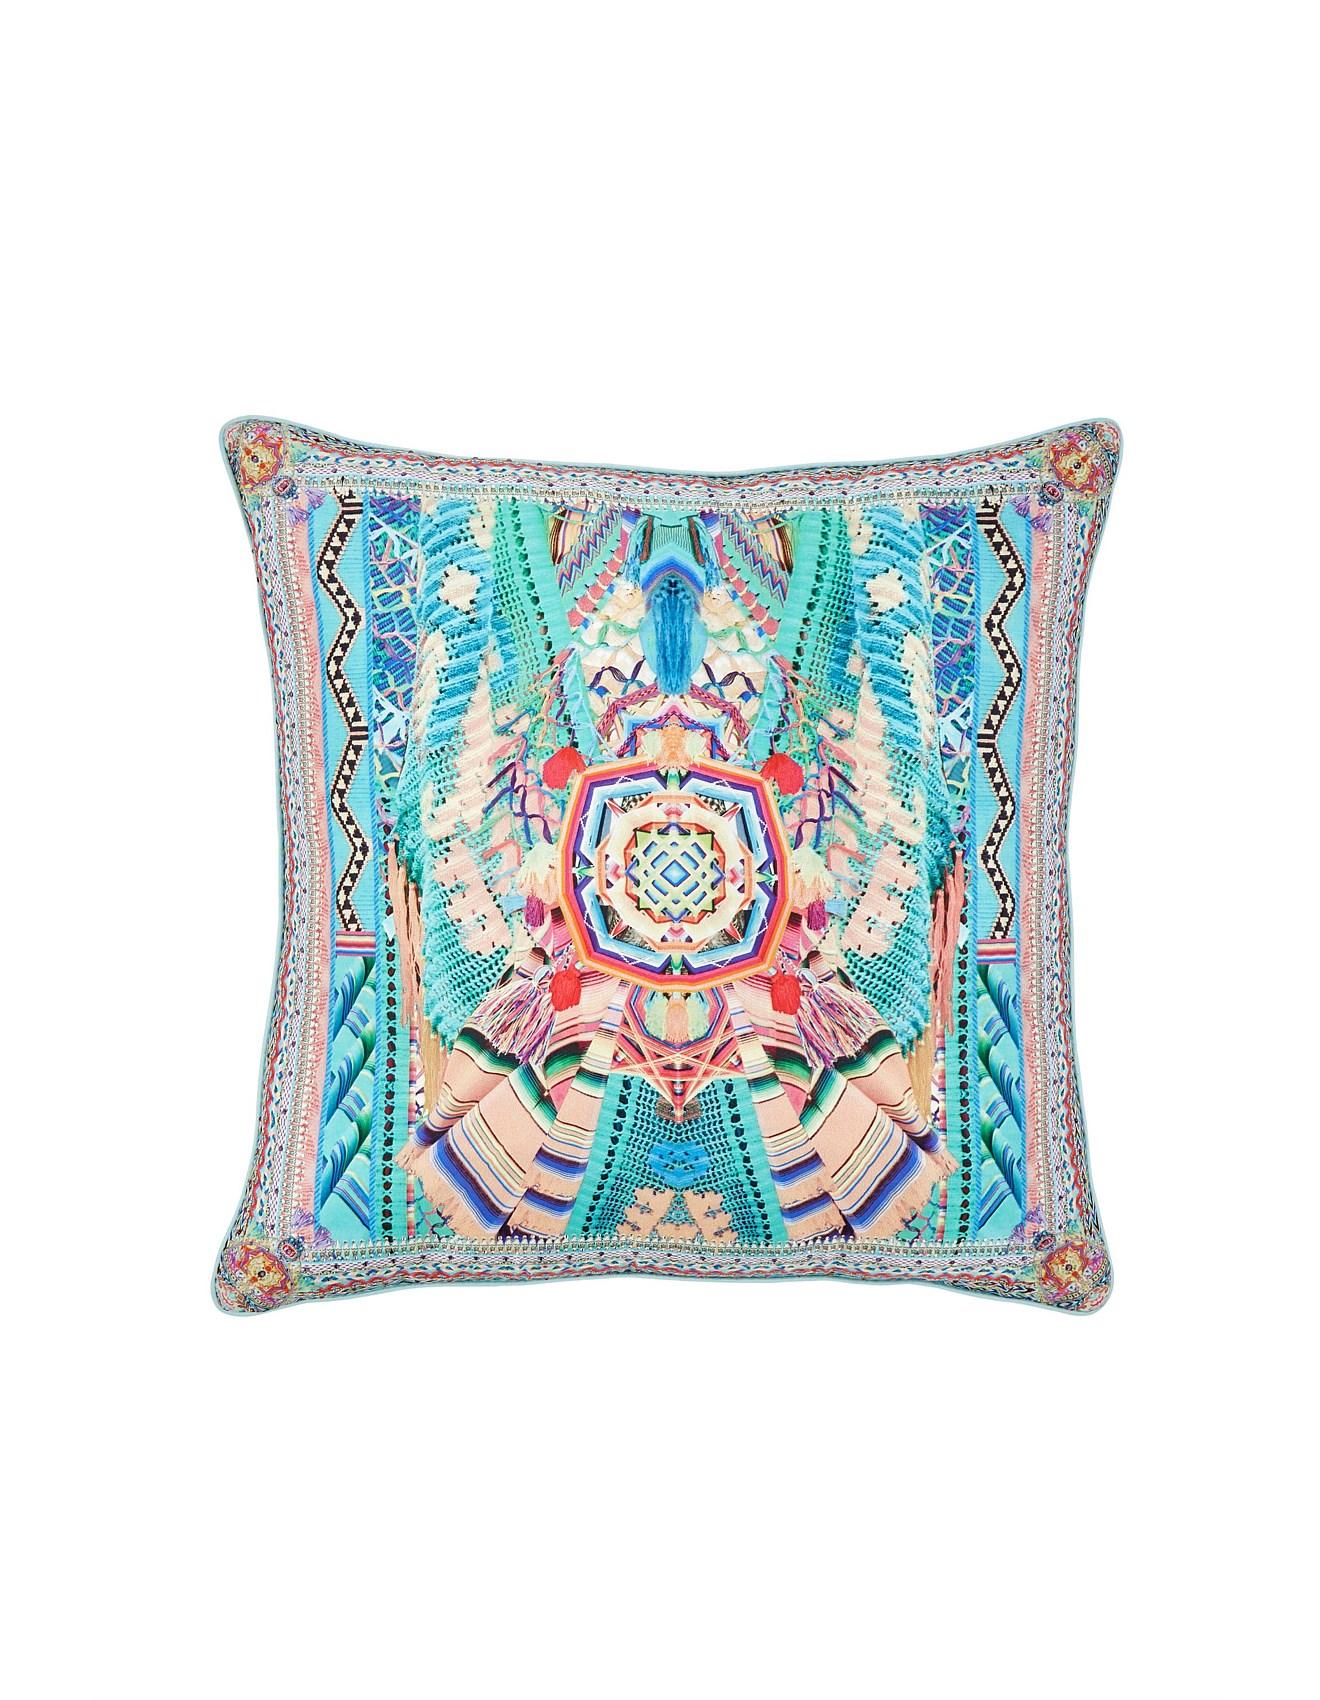 large square sofa cushions decor women 39s fashion buy clothing online david